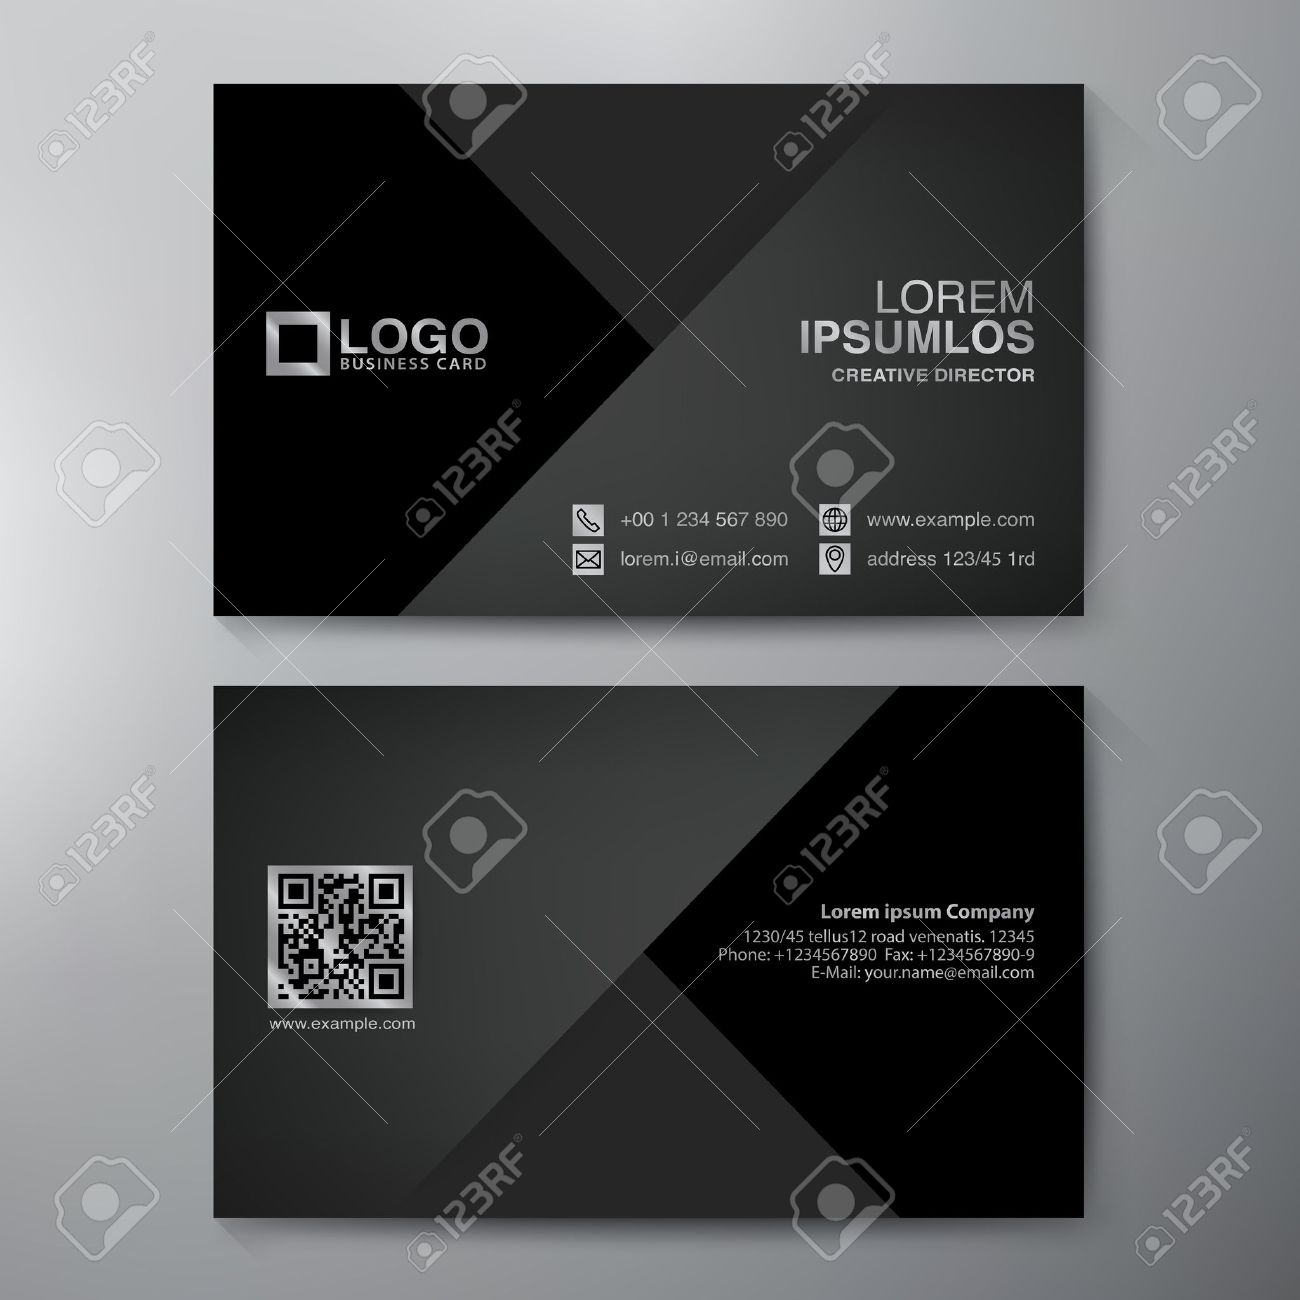 Beautiful monavie business cards contemporary business card best monavie business cards photos business card ideas etadamfo reheart Images